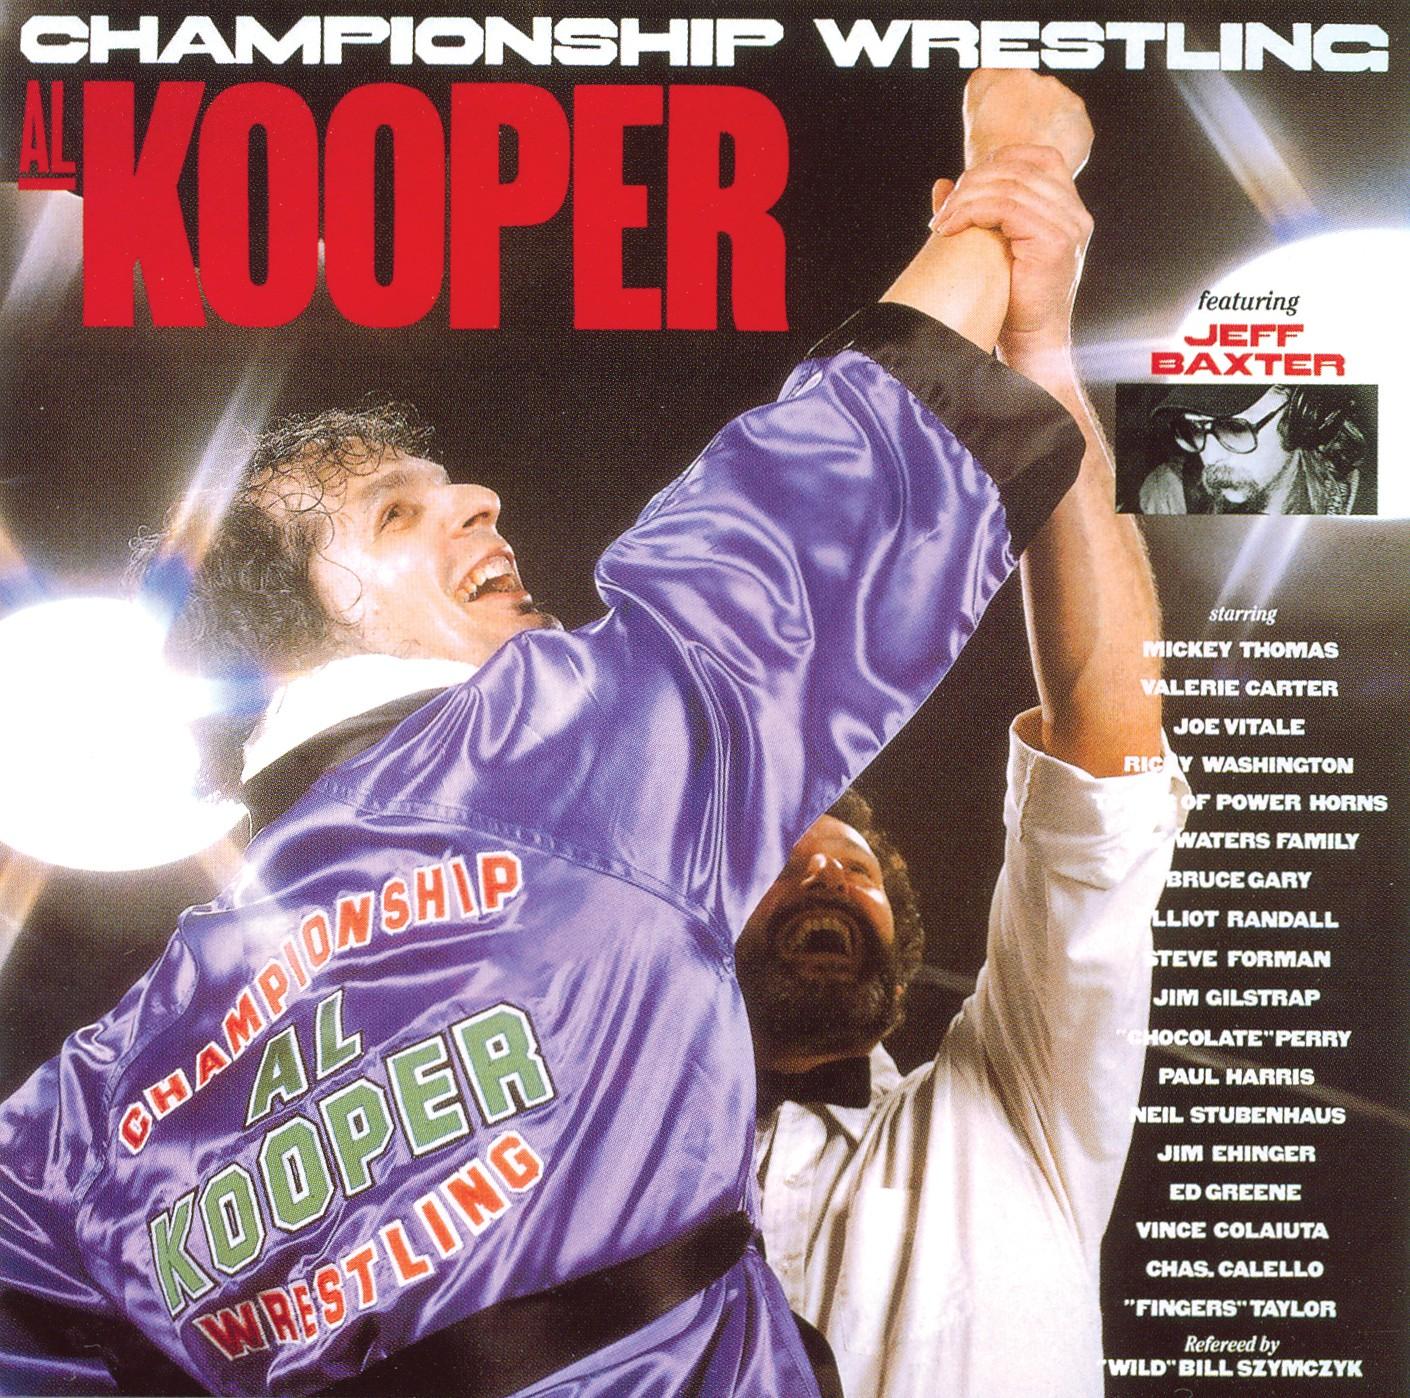 1982 Al Kooper – Championship Wrestling